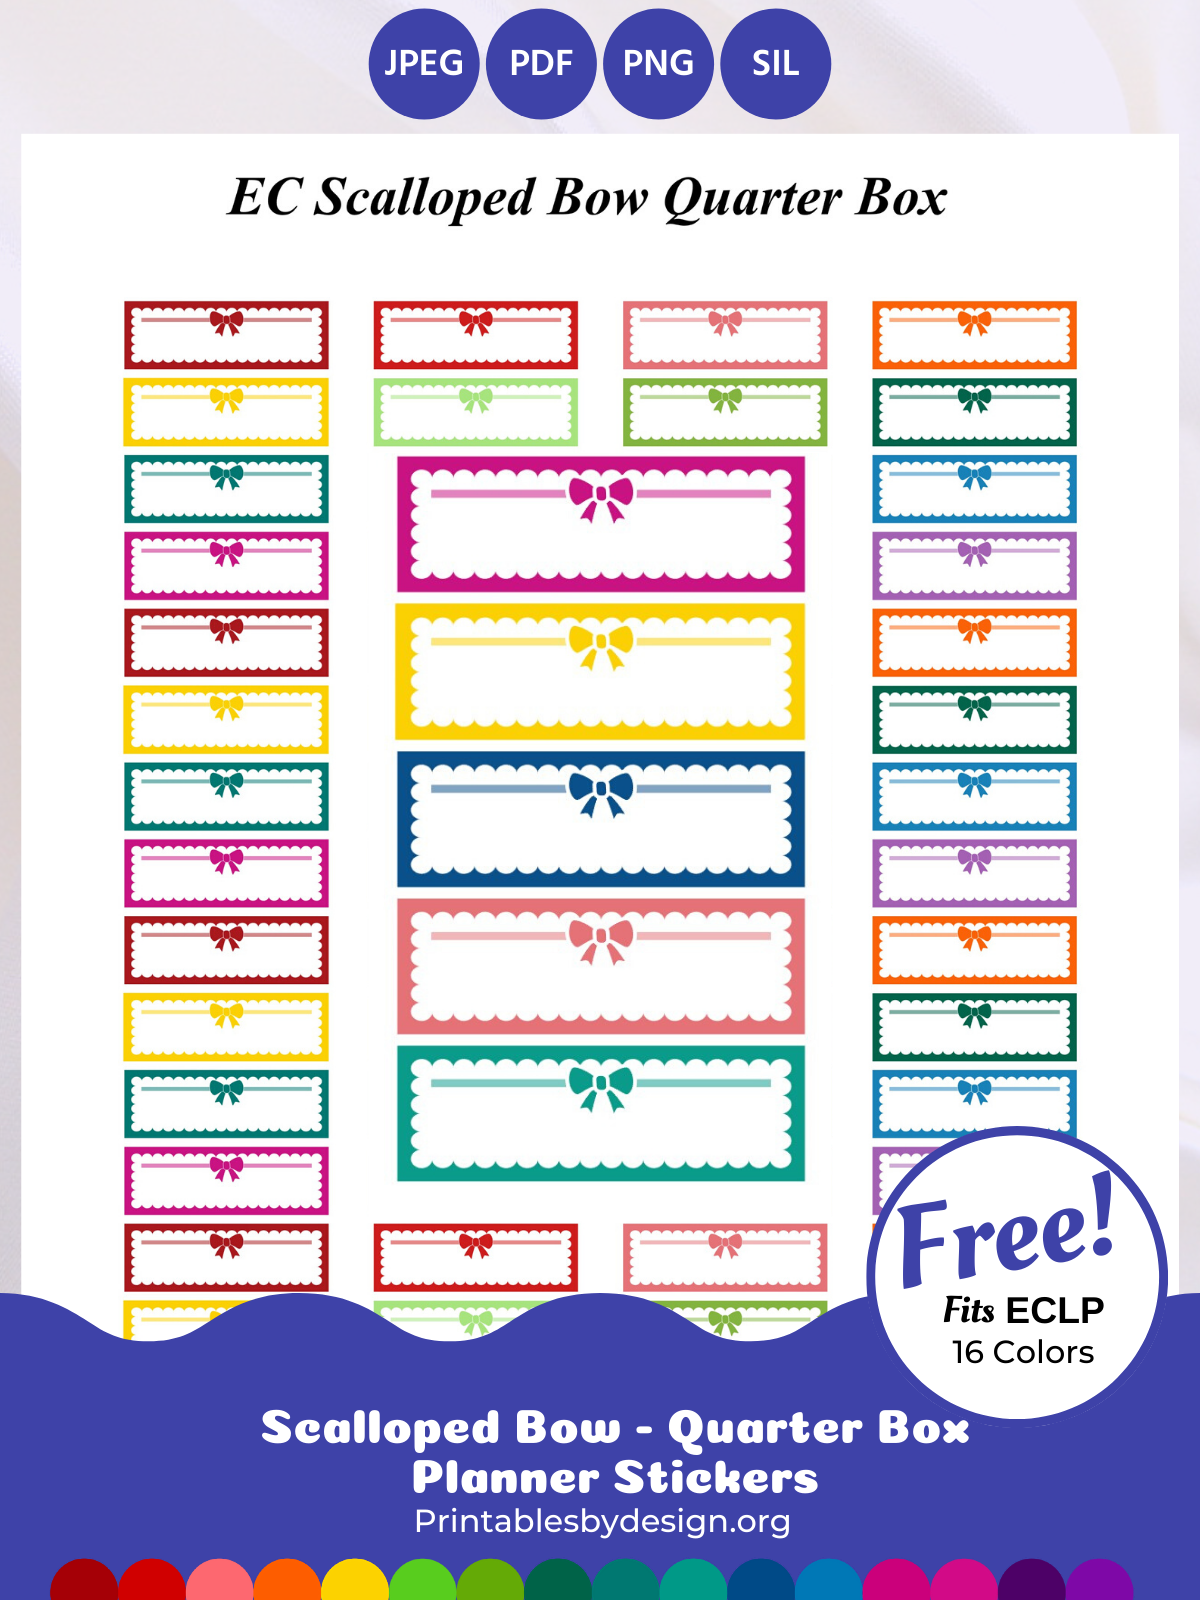 Erin Condren Planner Stickers Quarter Box Printable Stickers Cut Files 70/% OFF Sale Bow Quarter Box Printable Planner Stickers